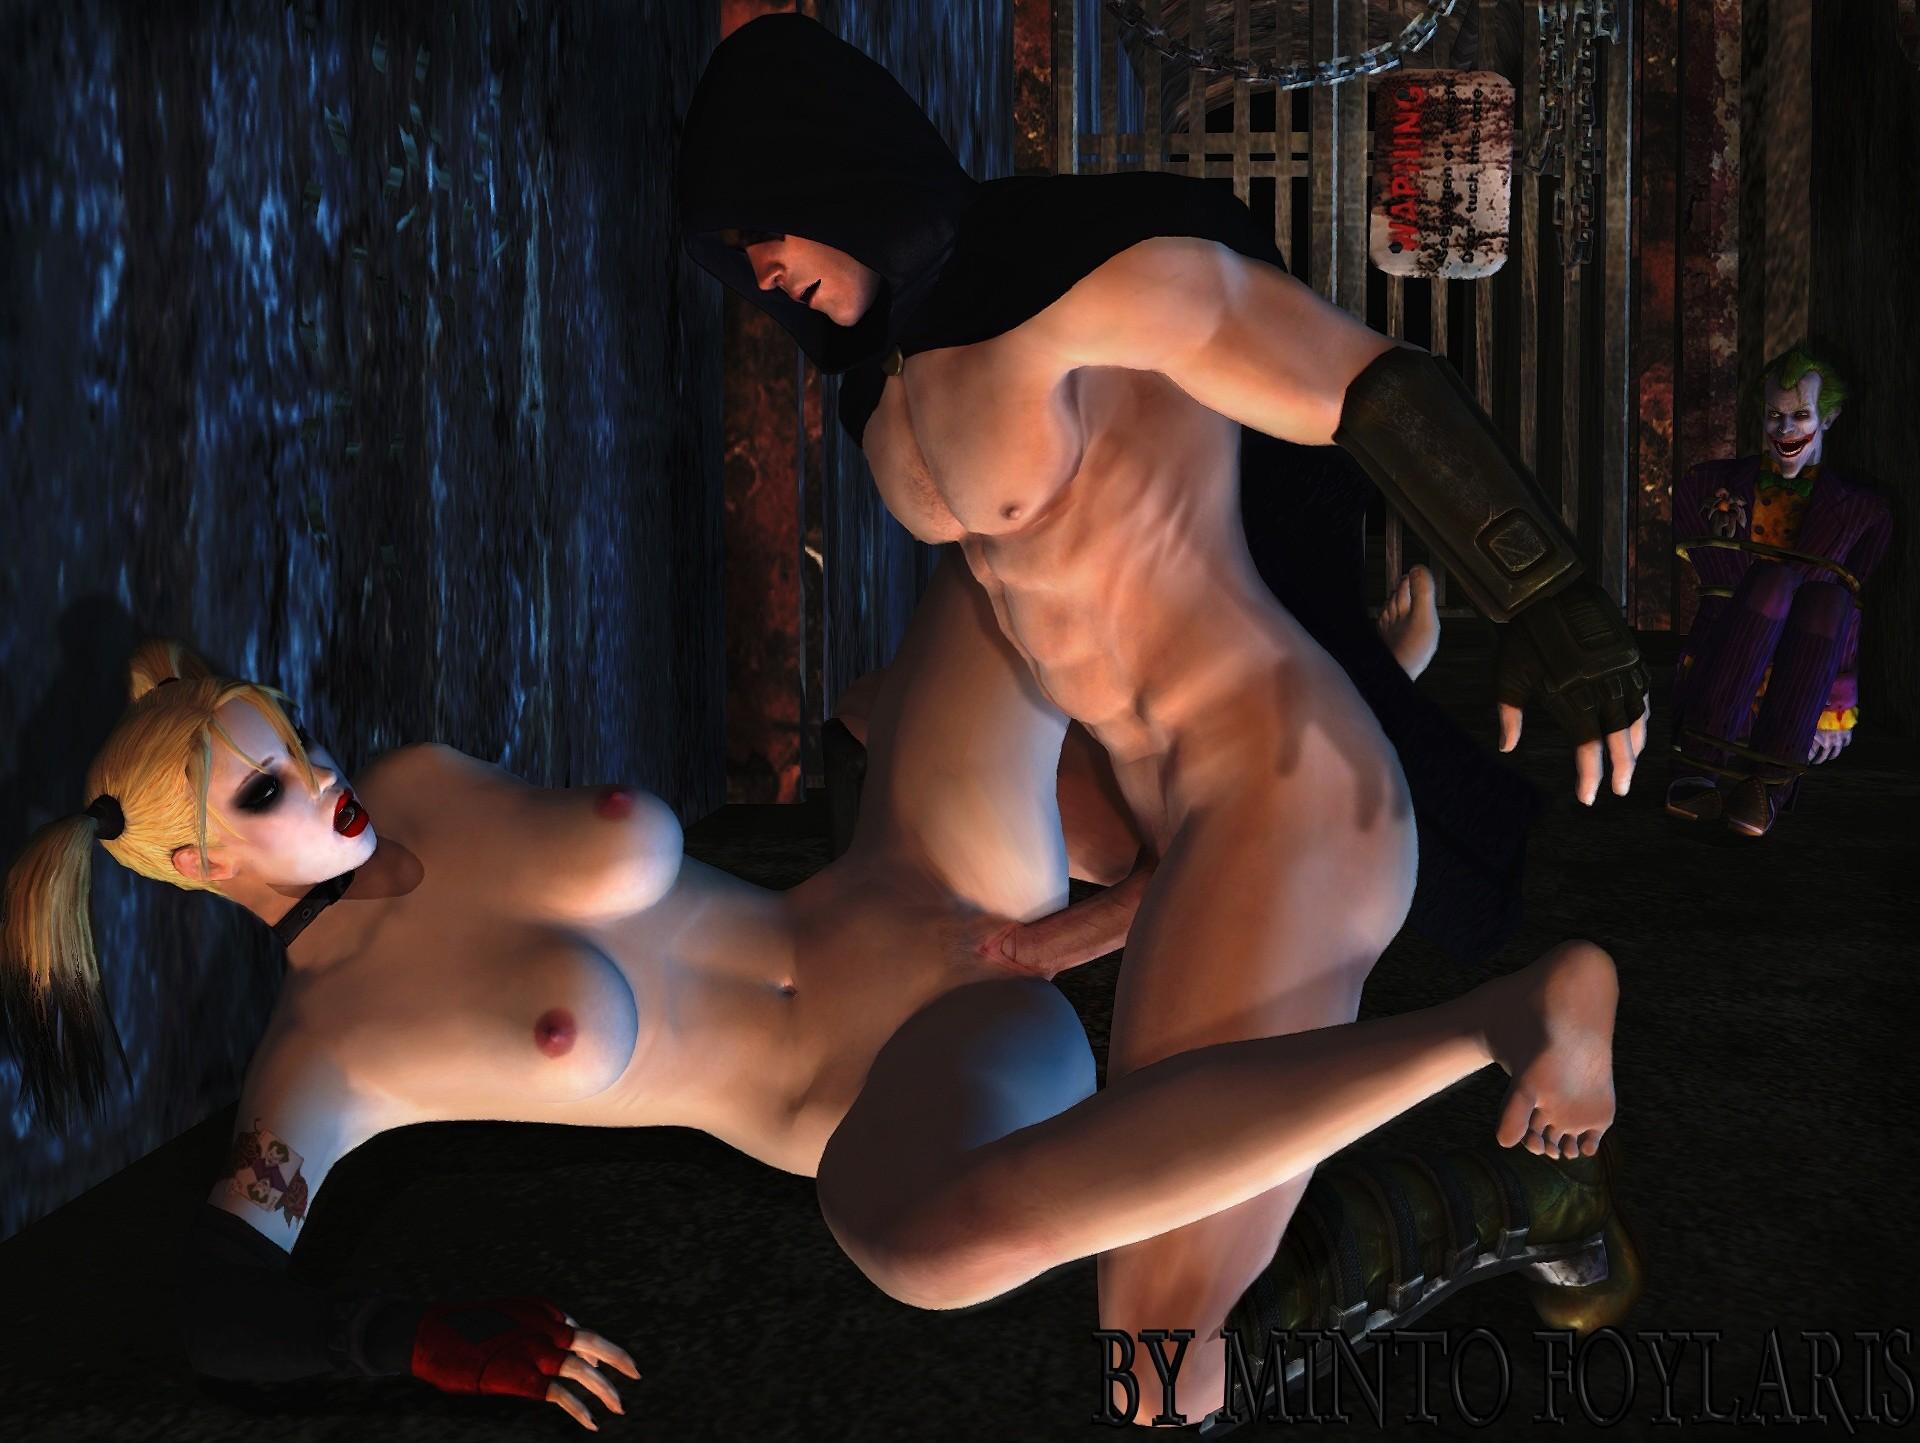 Batman arkham city fotos hentai nude streaming